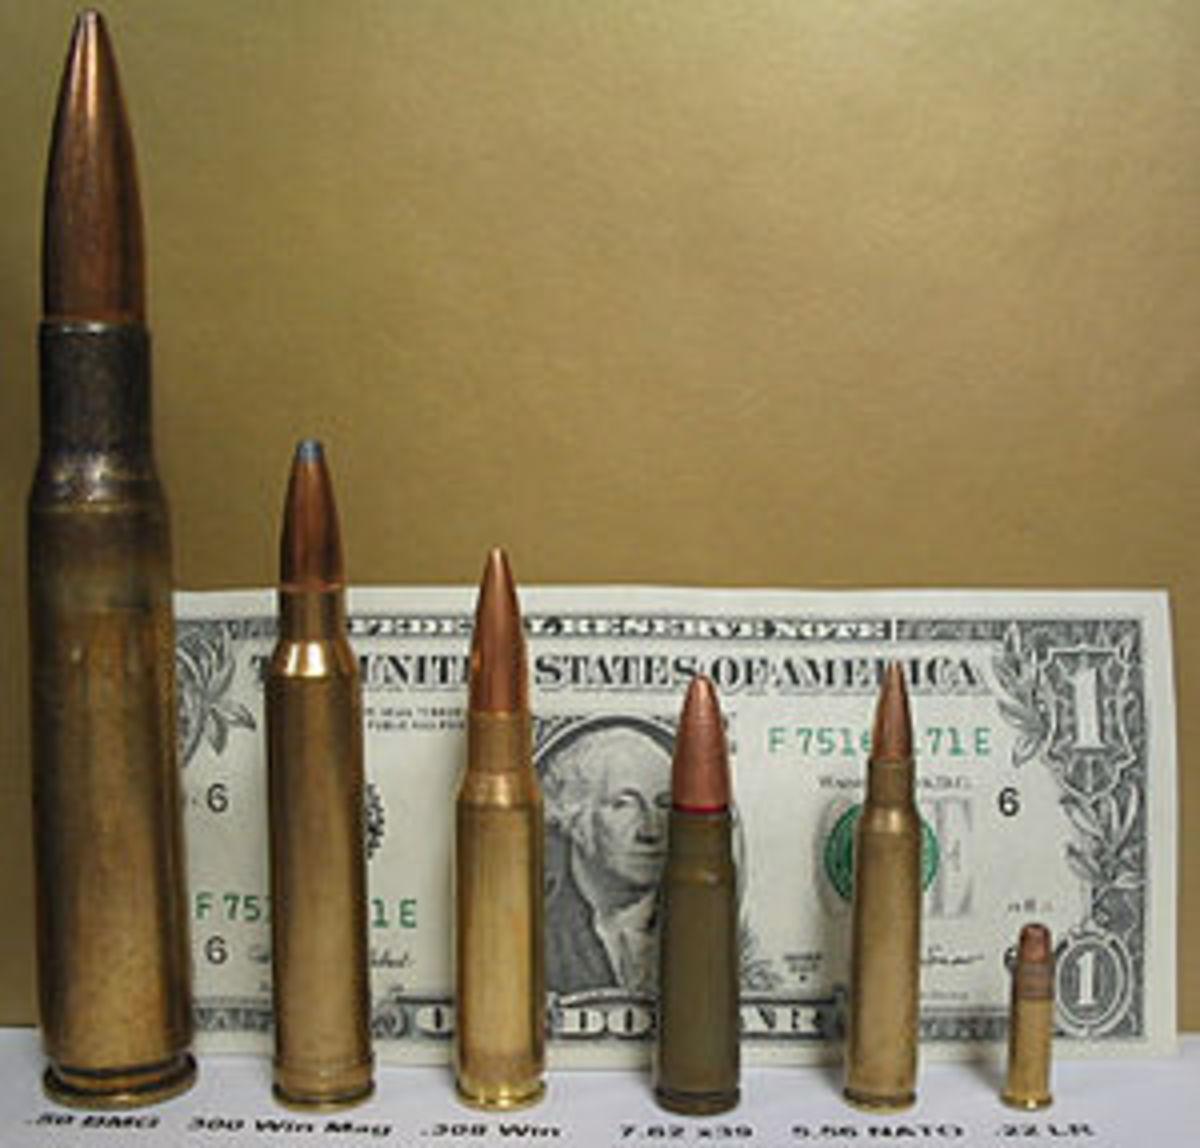 From left: .50 BMG, 300 Win Mag, 7.62x51mm NATO, 7.62×39mm, 5.56×45mm NATO, .22LR